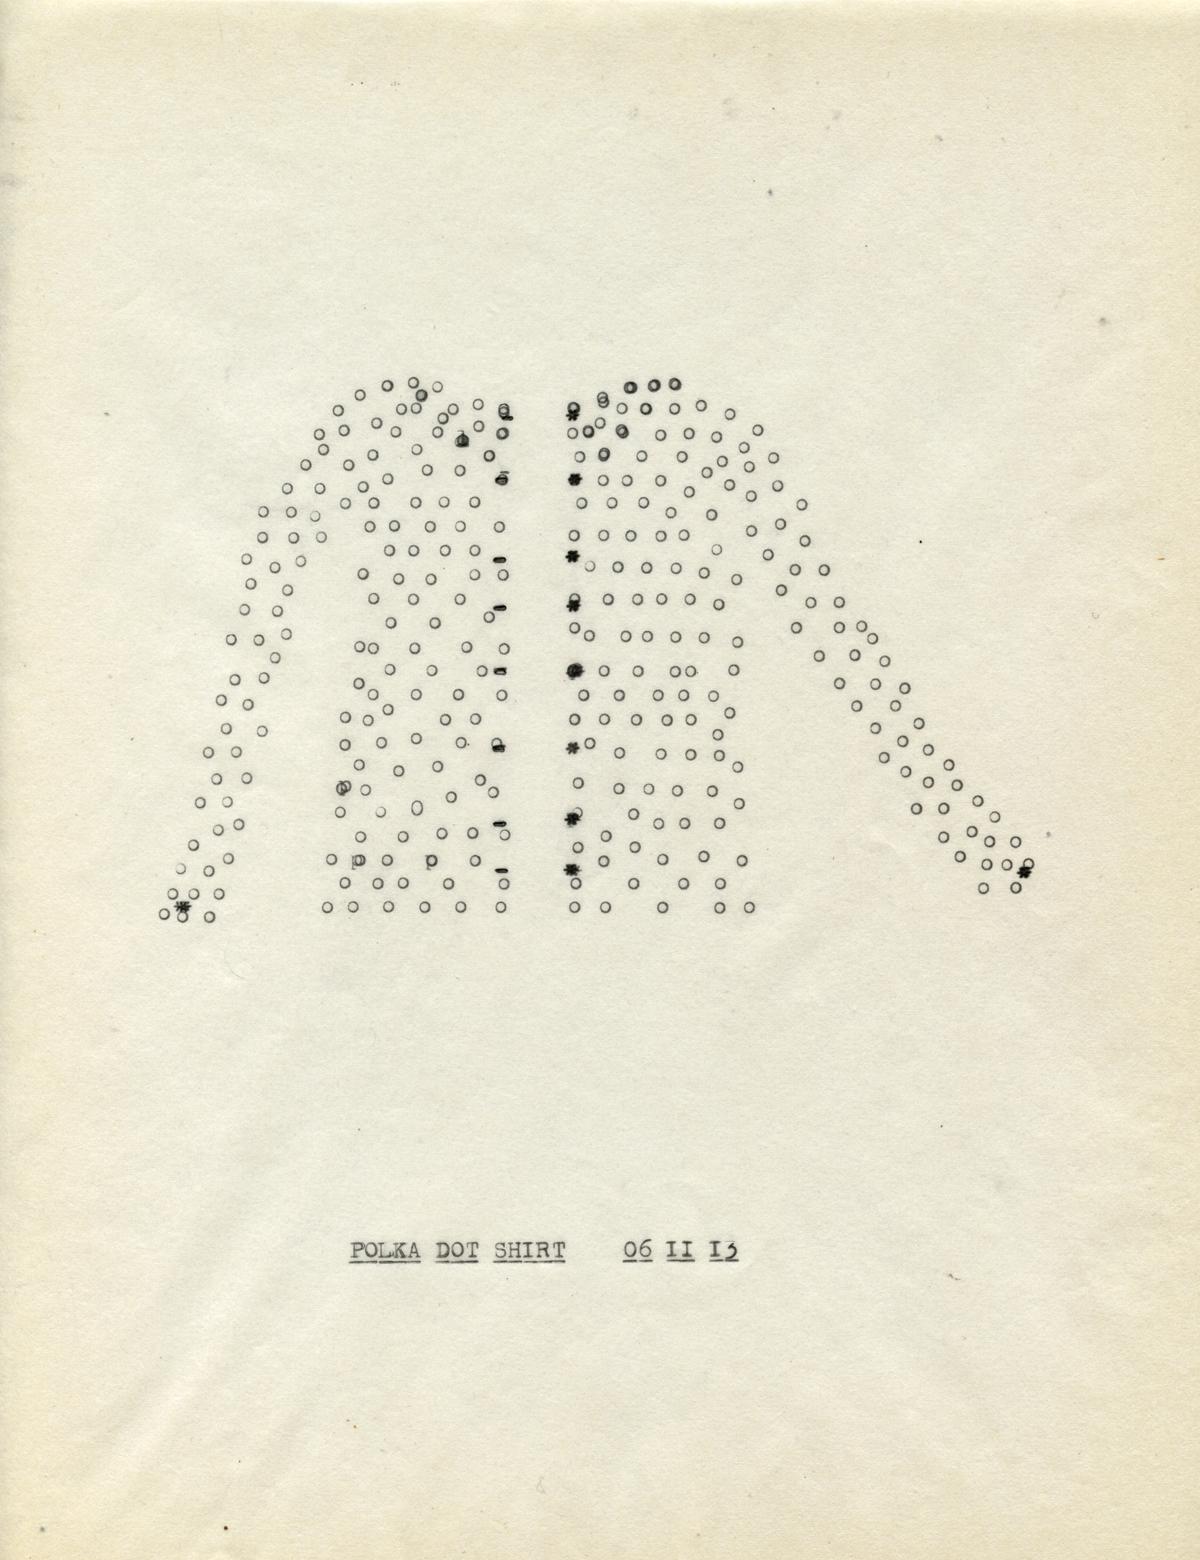 tw_06_11_2013_polka_dot_shirt.jpg